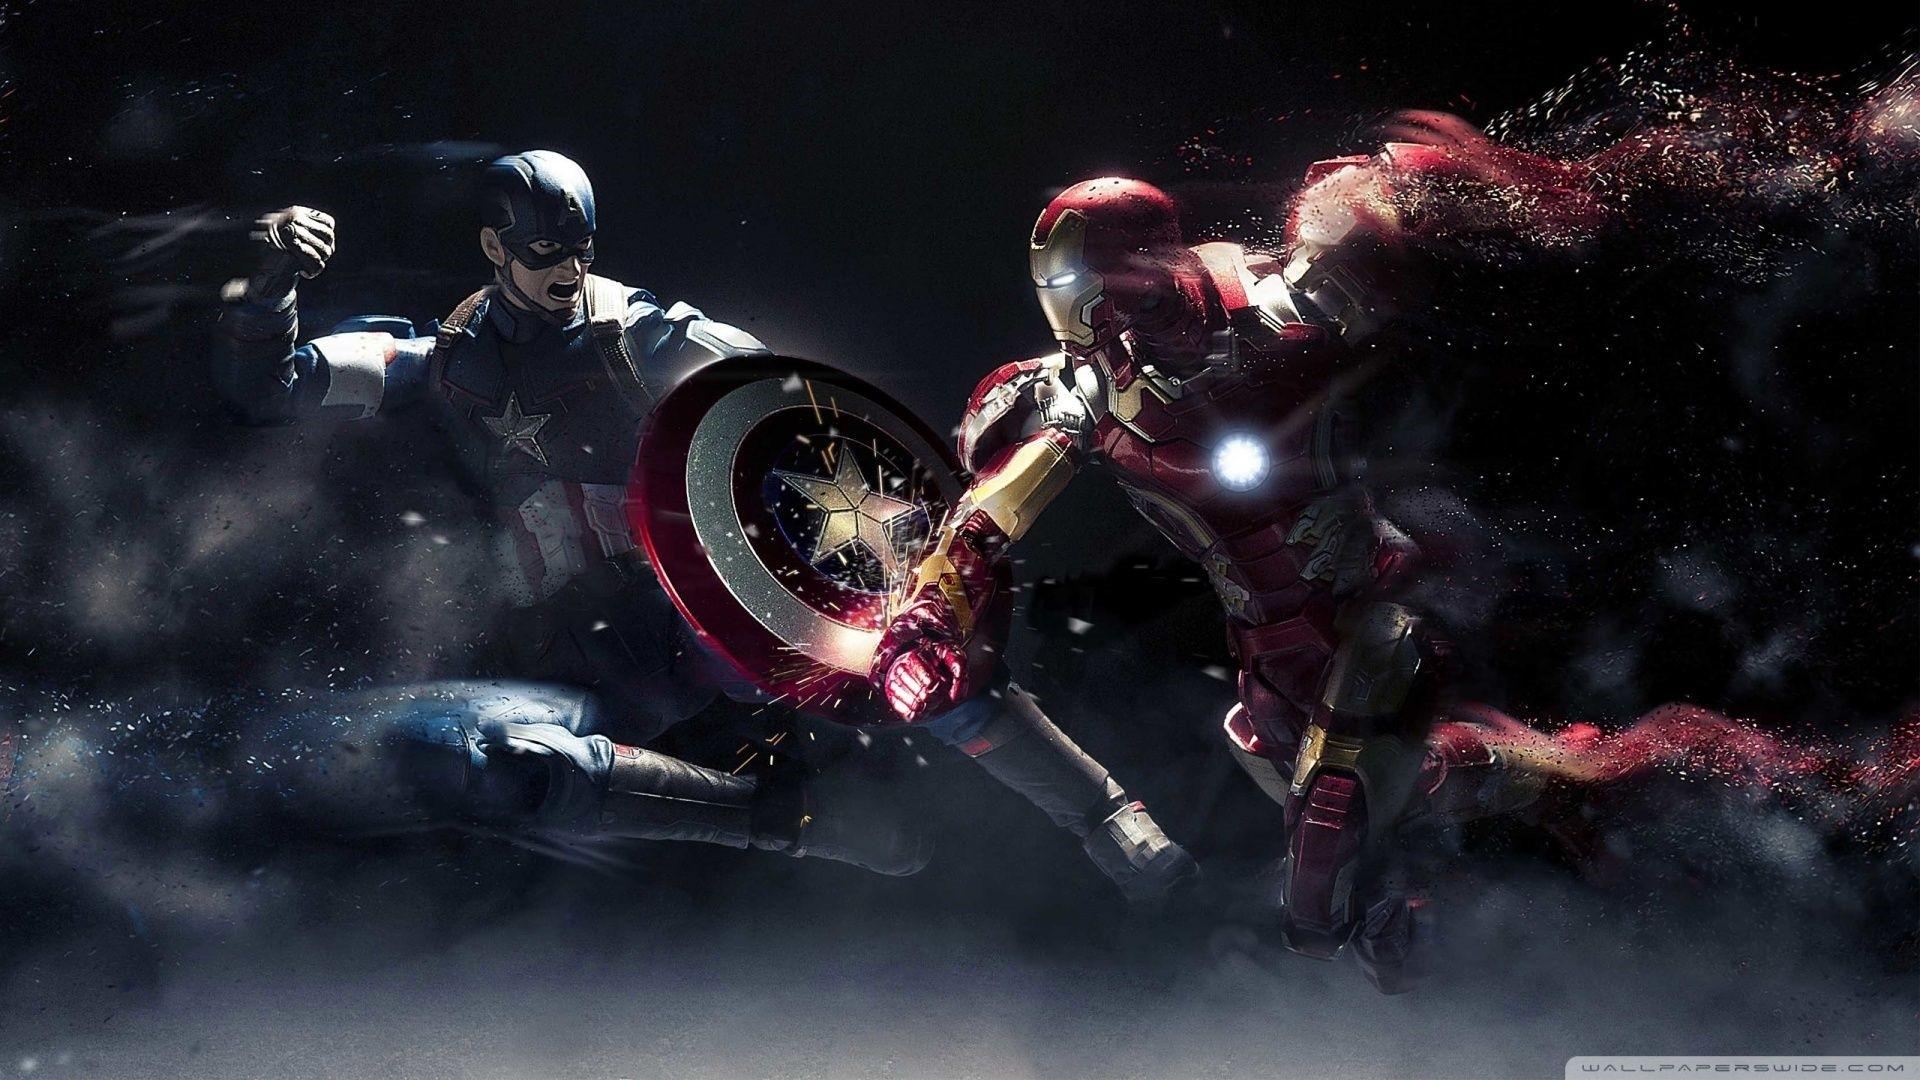 Captain America wallpaper download